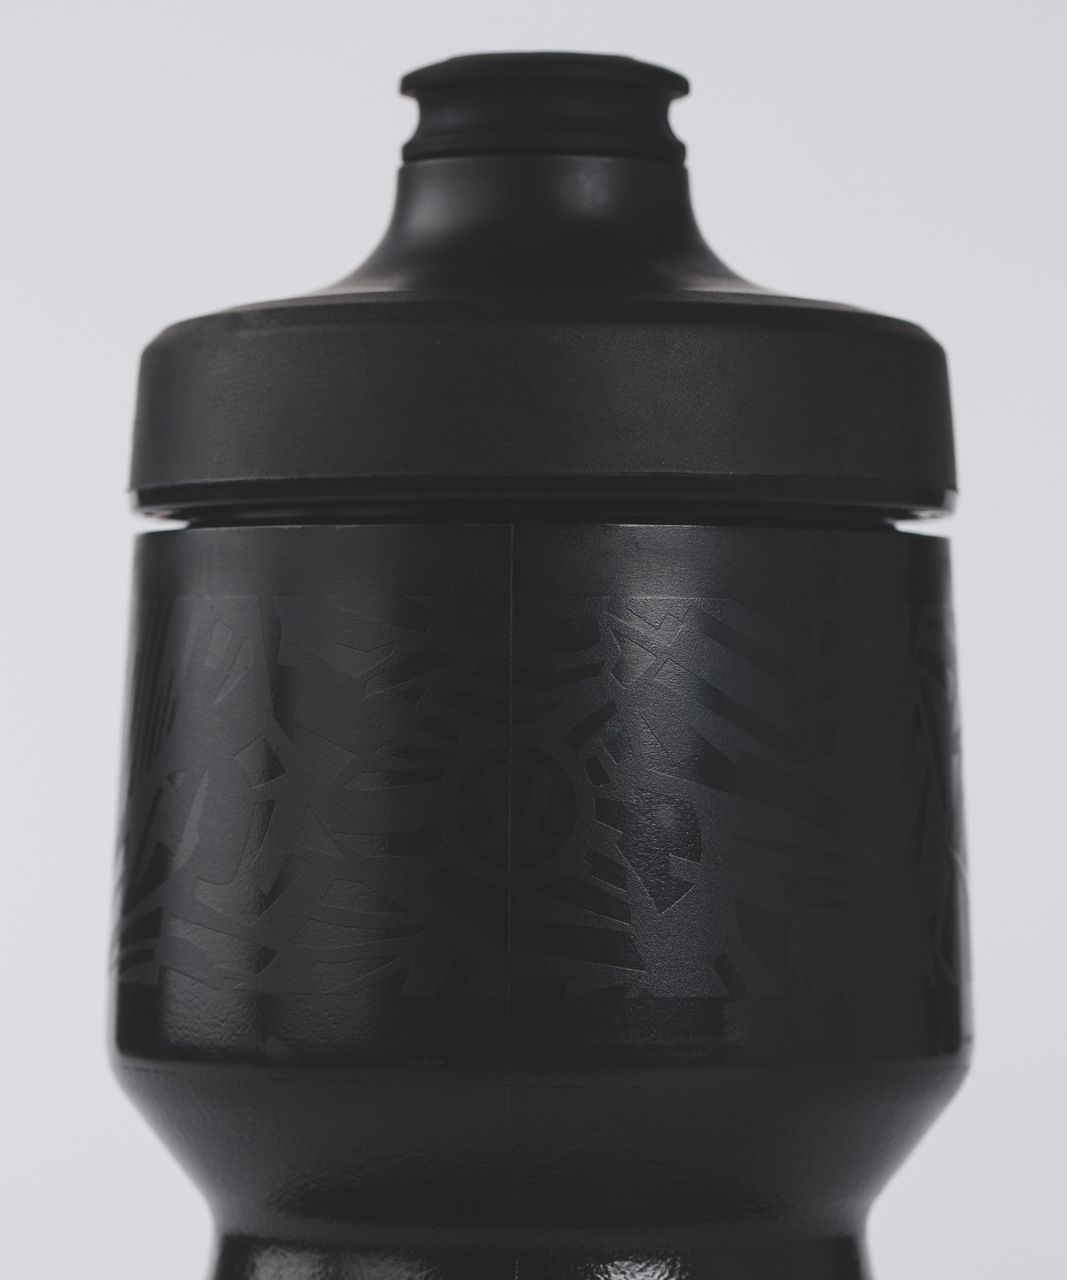 Lululemon Purist Cycling Waterbottle - Black Cubix Purist